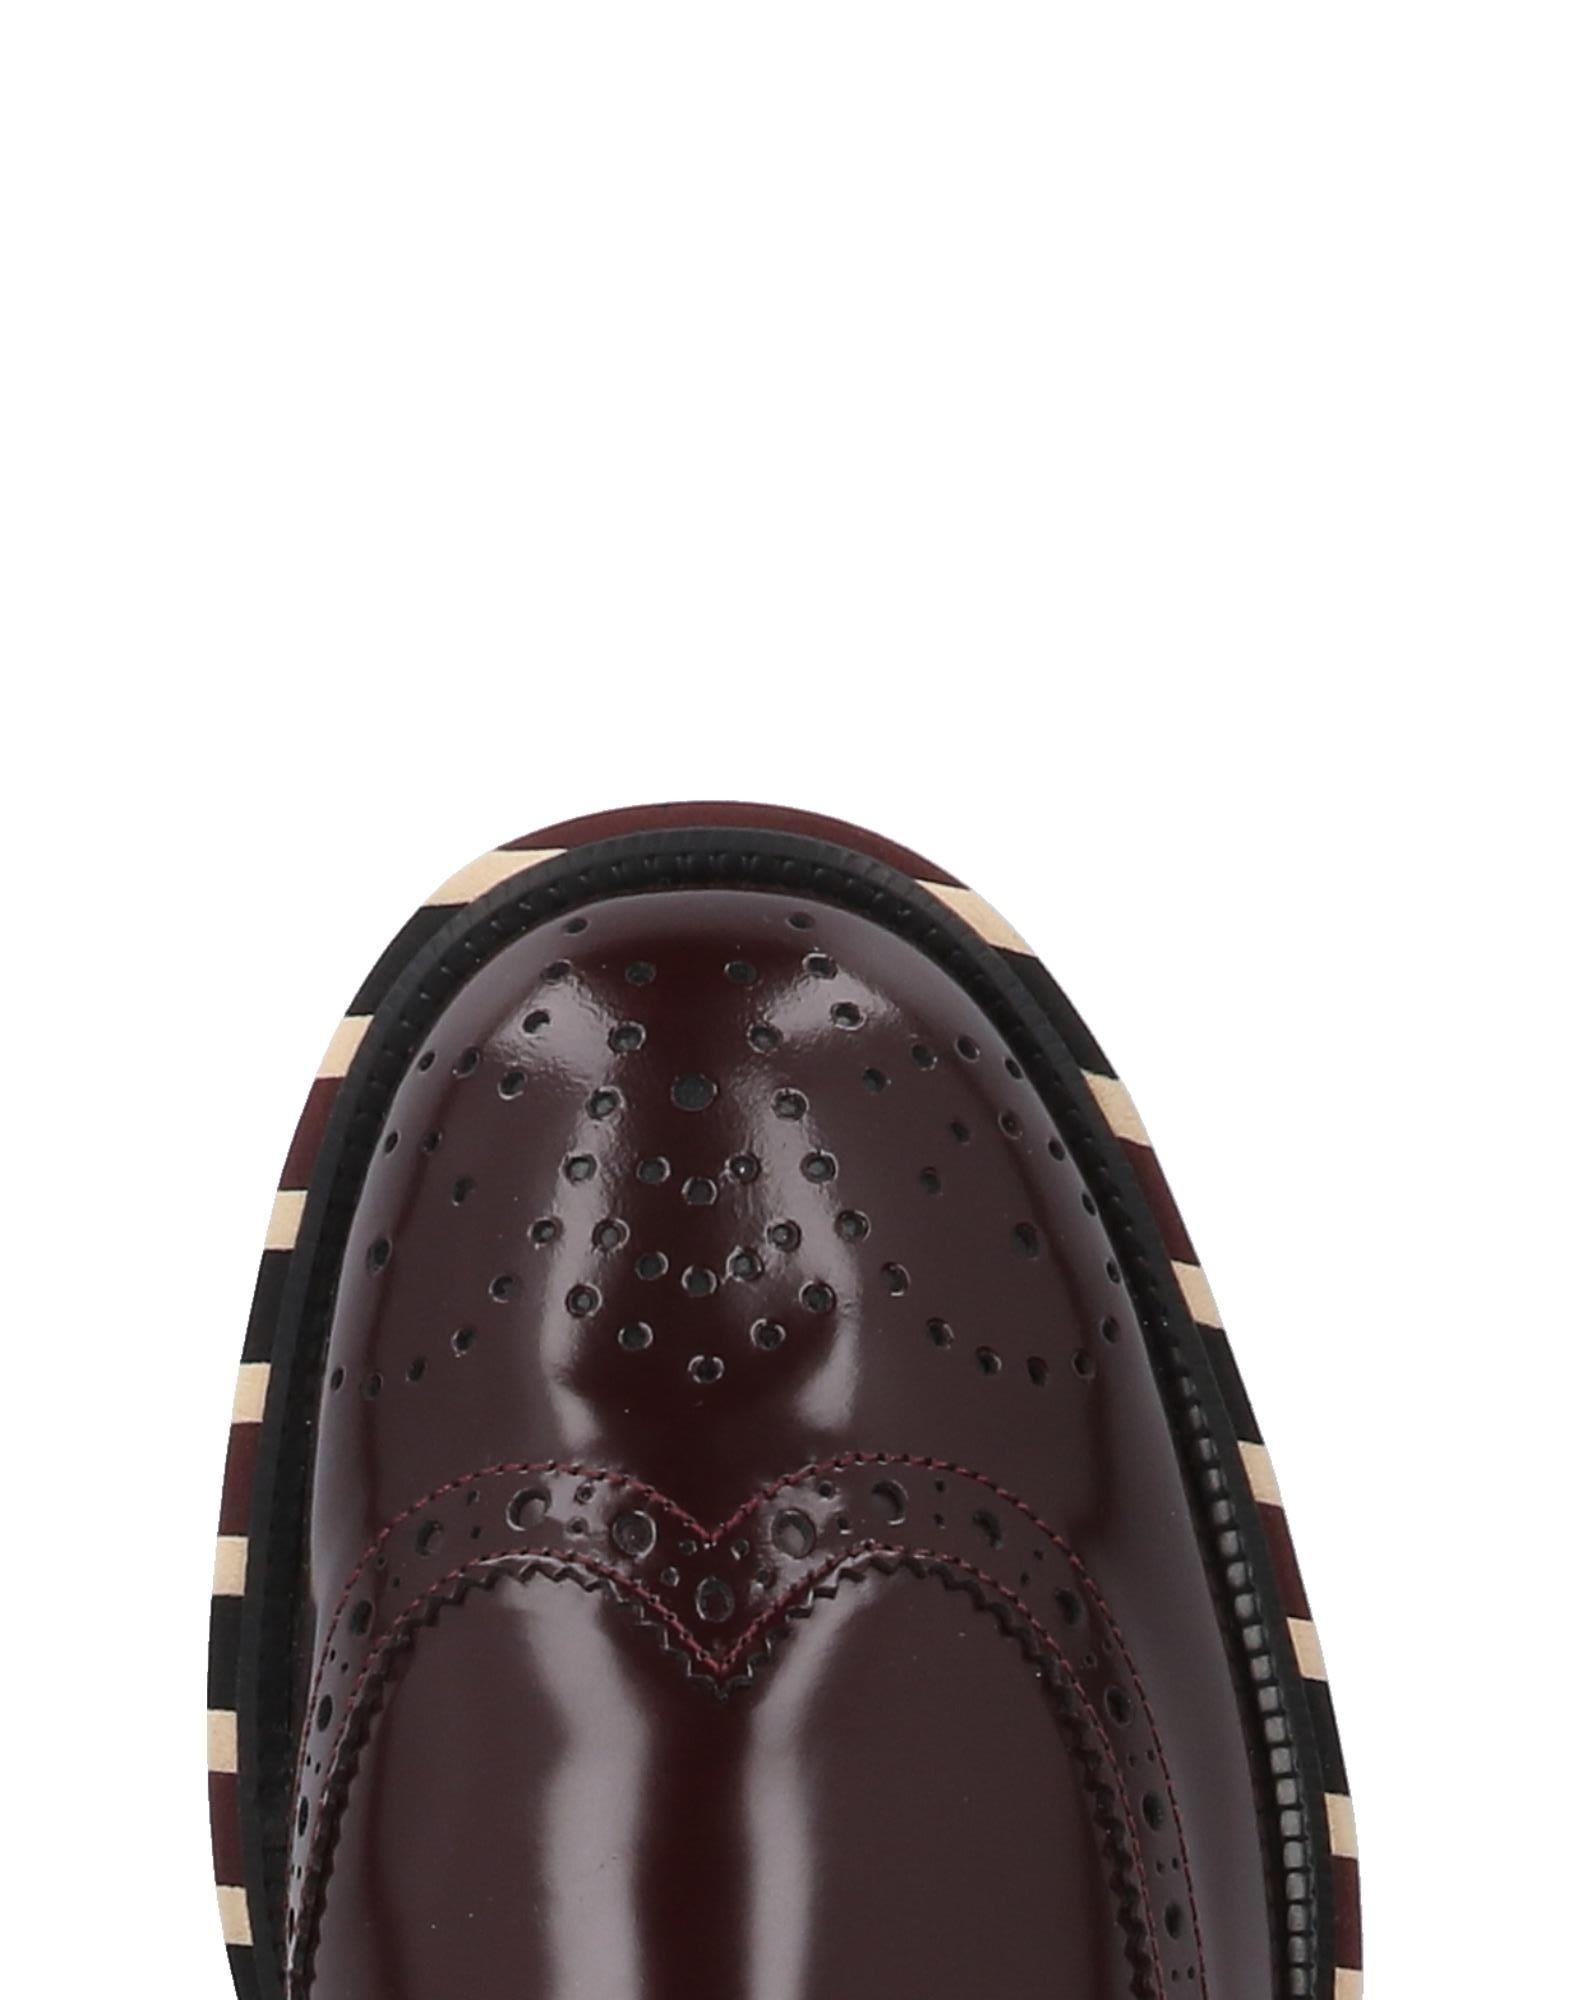 Gut um billige Schuhe Damen zu tragenPaloma Barceló Schnürschuhe Damen Schuhe 11475677CA fc4179